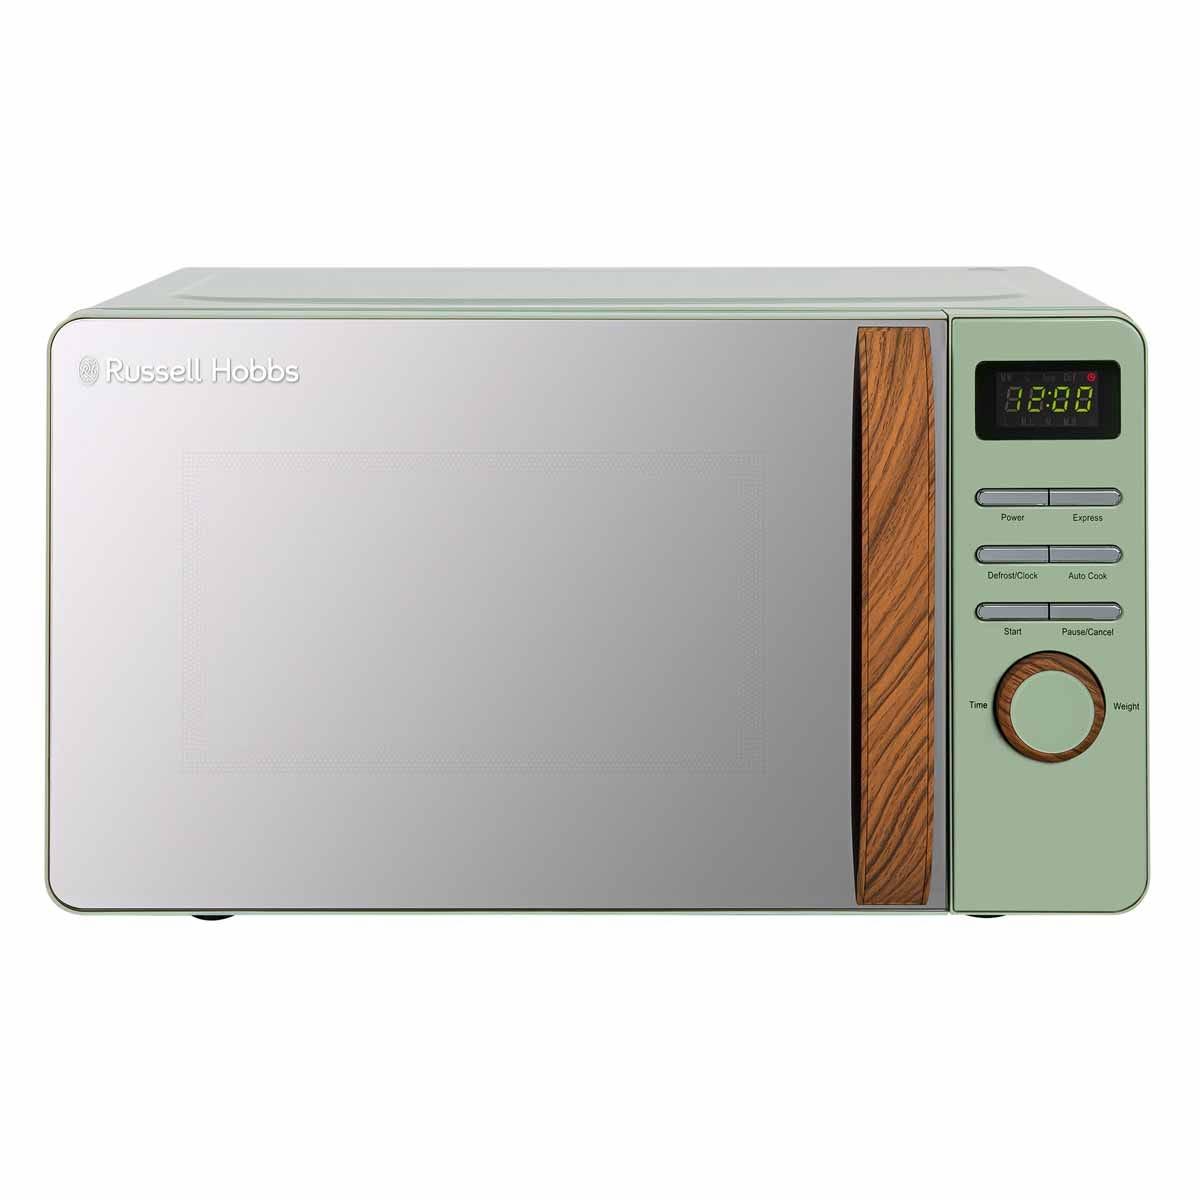 Russell Hobbs RHMMD714MG-N 17L 700W Digital Microwave - Matt Green with Wooden Effect Handle